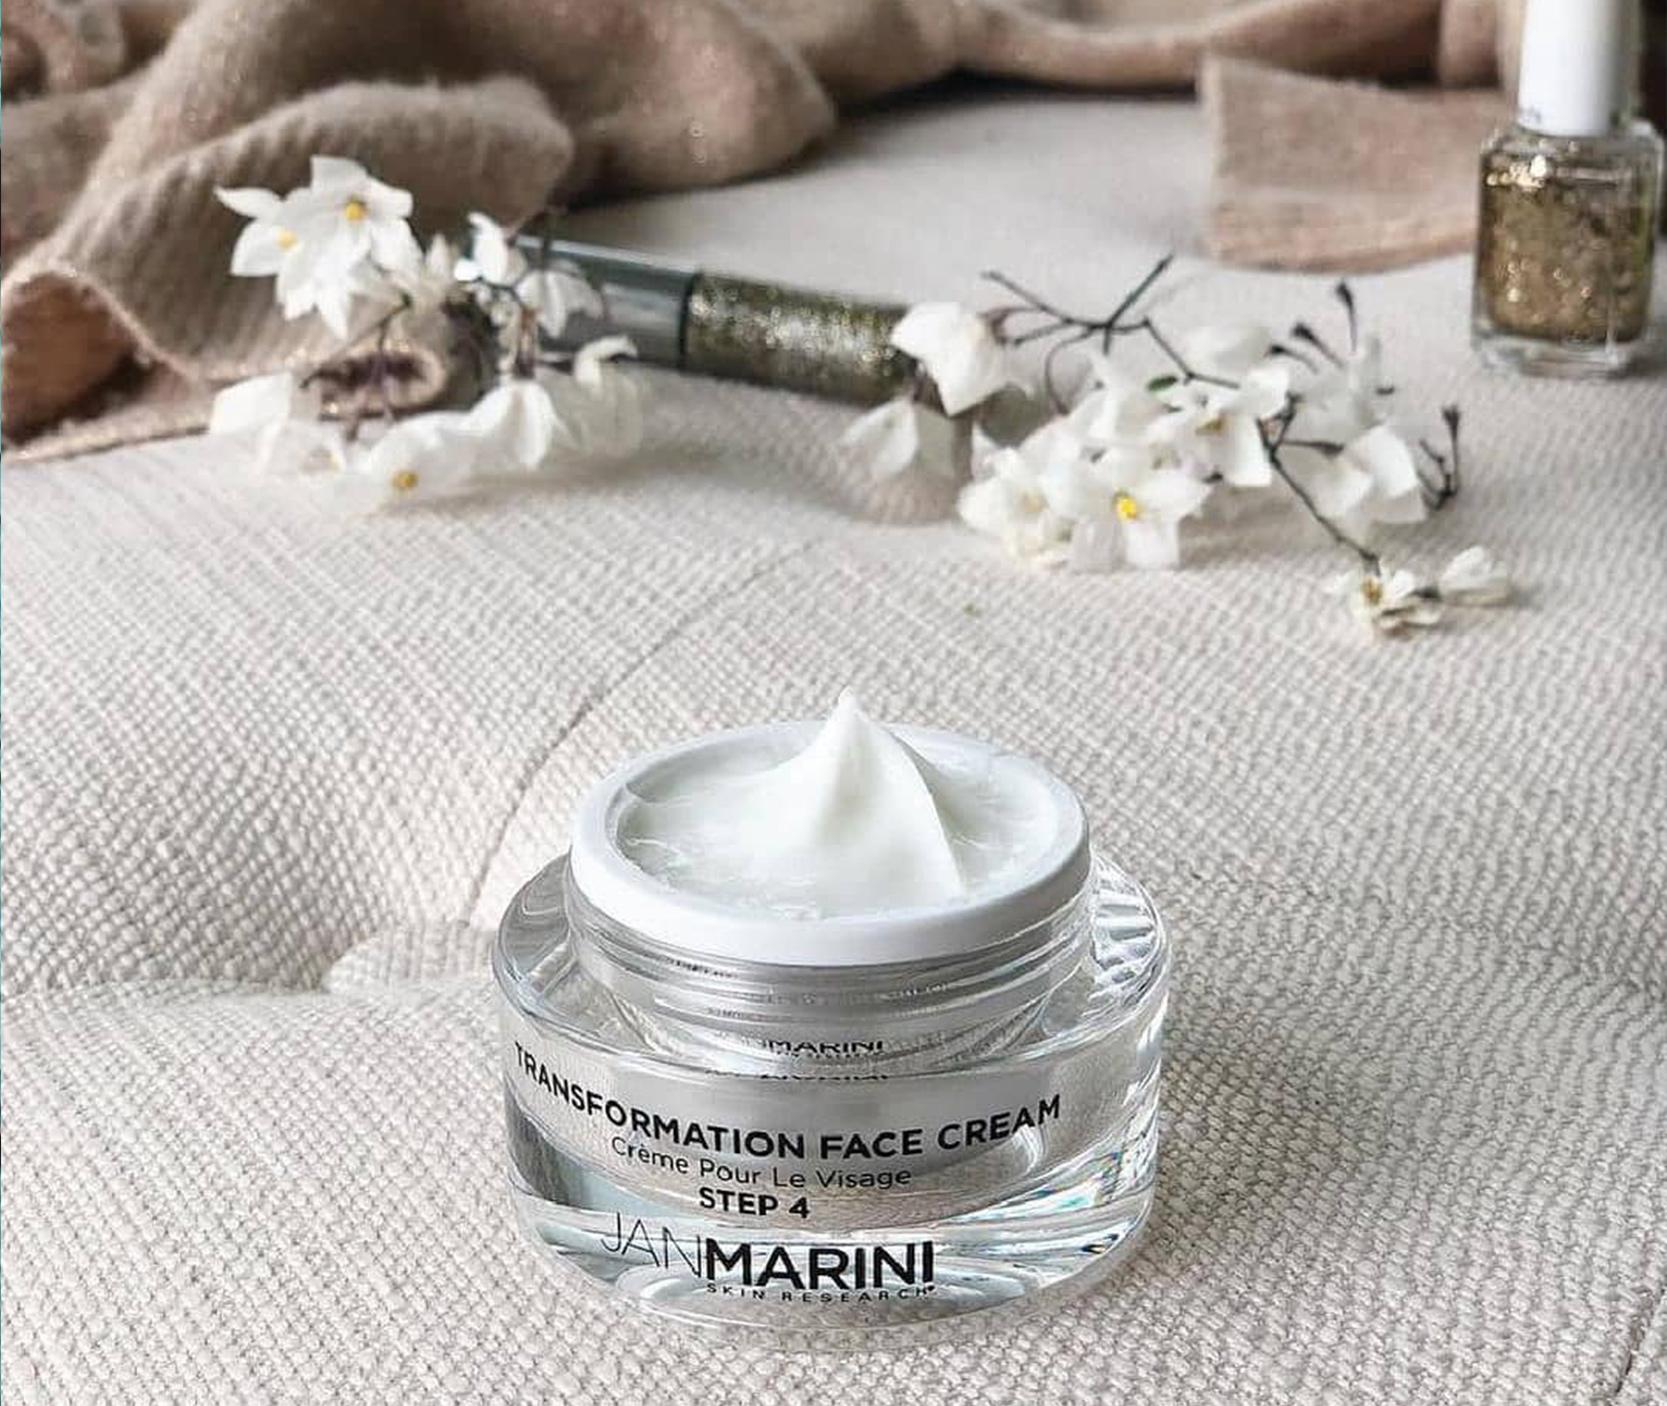 Jan Marini: Transformation Face Cream